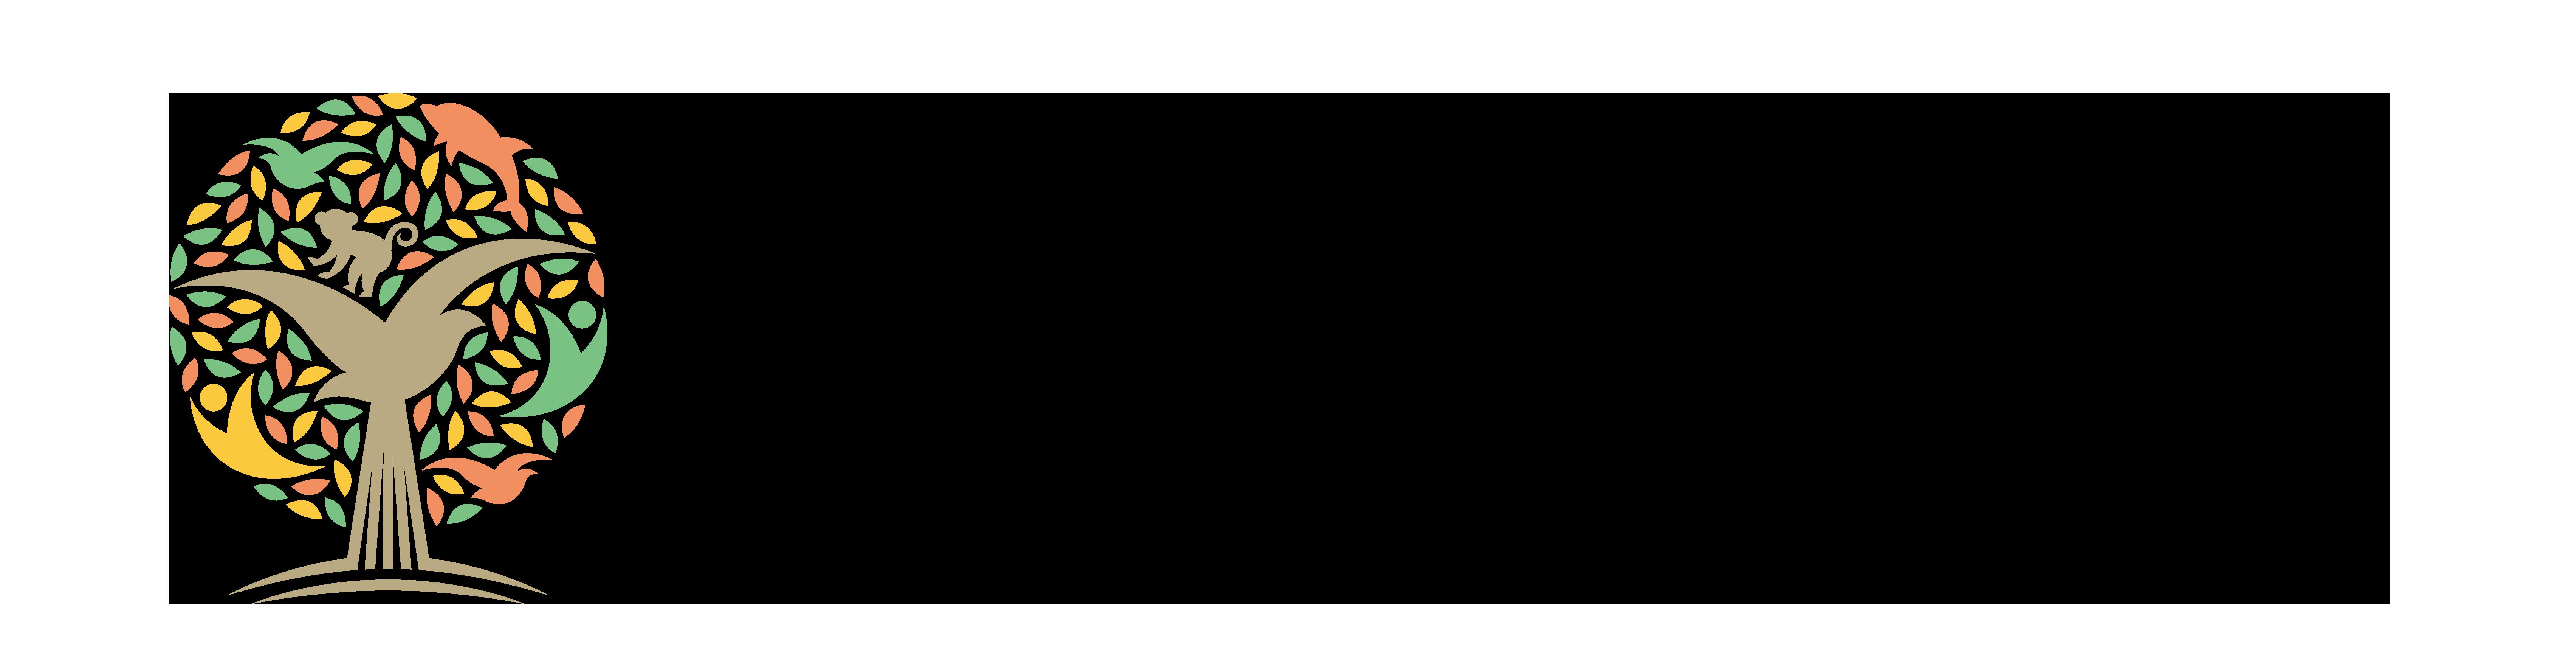 Gemston ロゴ